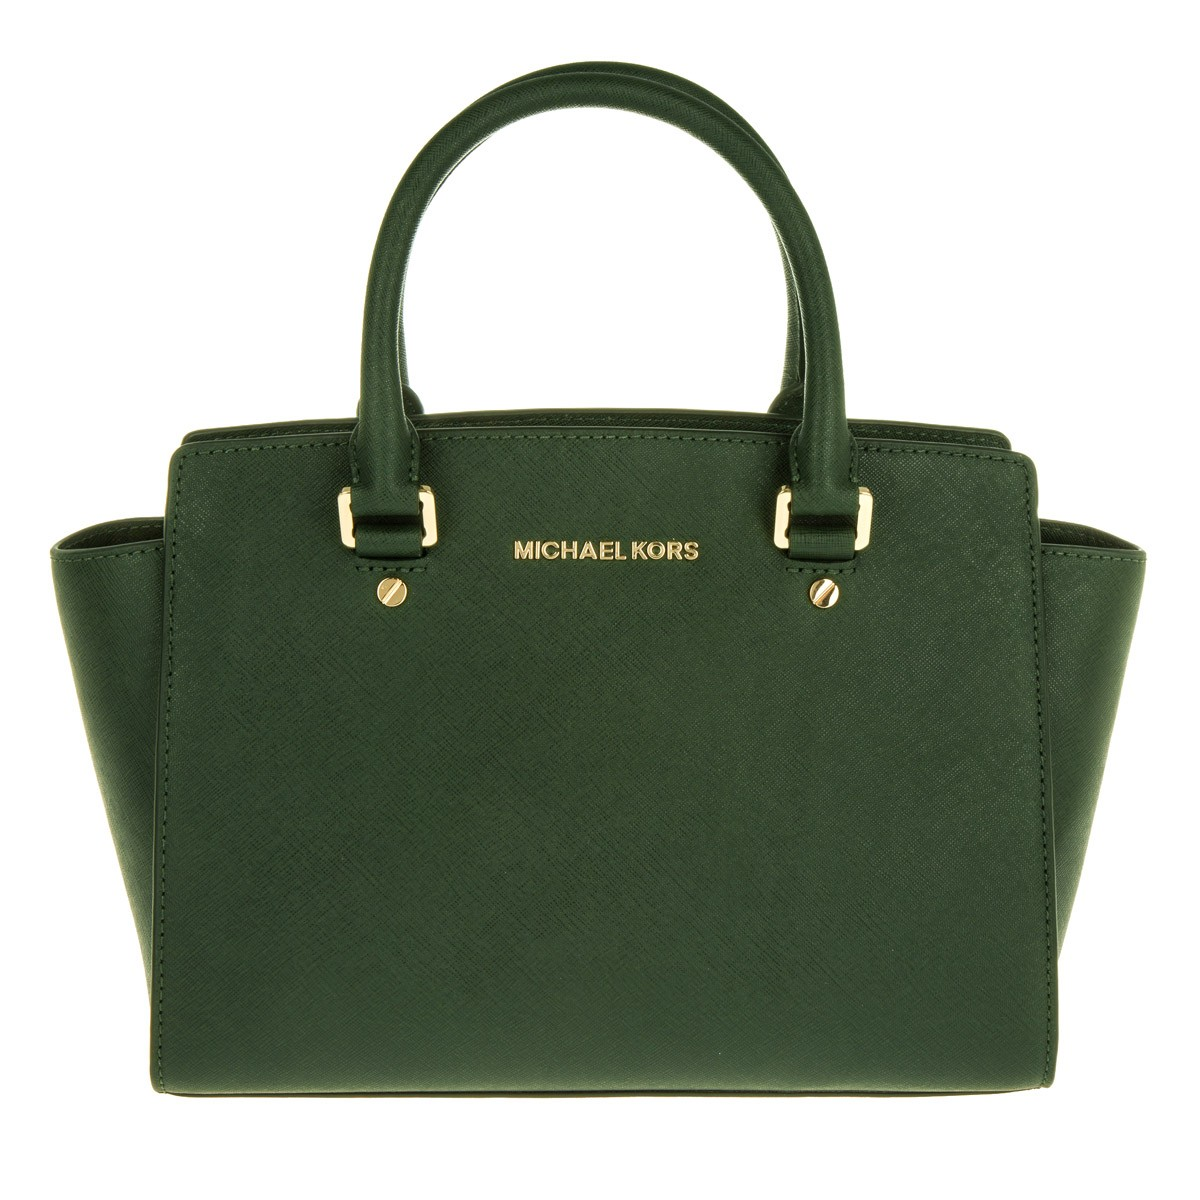 Michael Kors Satchel Bag - Selma MD TZ Satchel Moss - in grün - für Damen